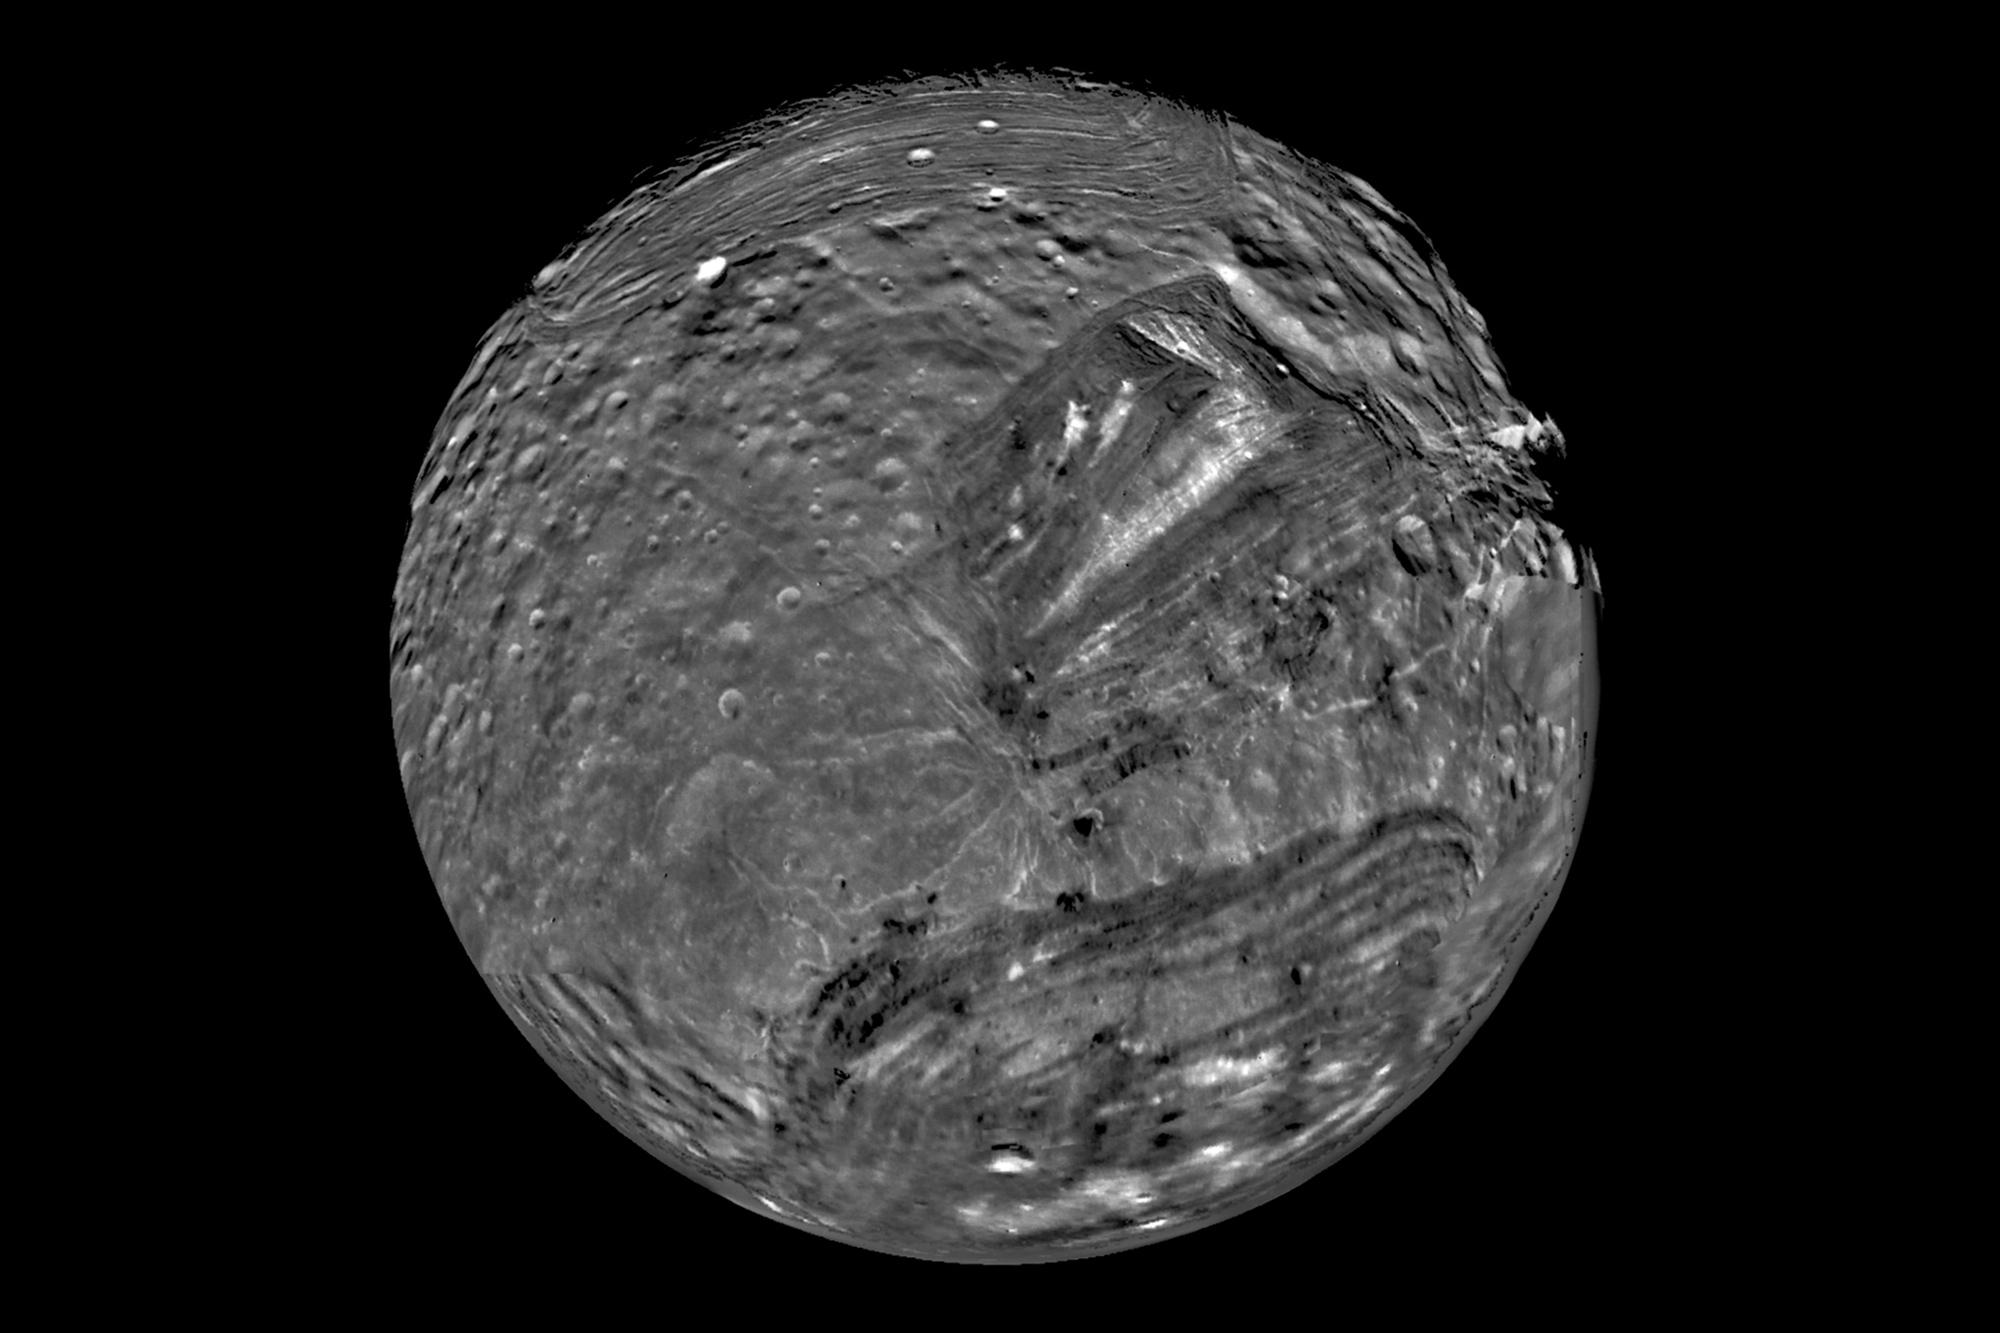 ophelia moon of uranus - photo #10